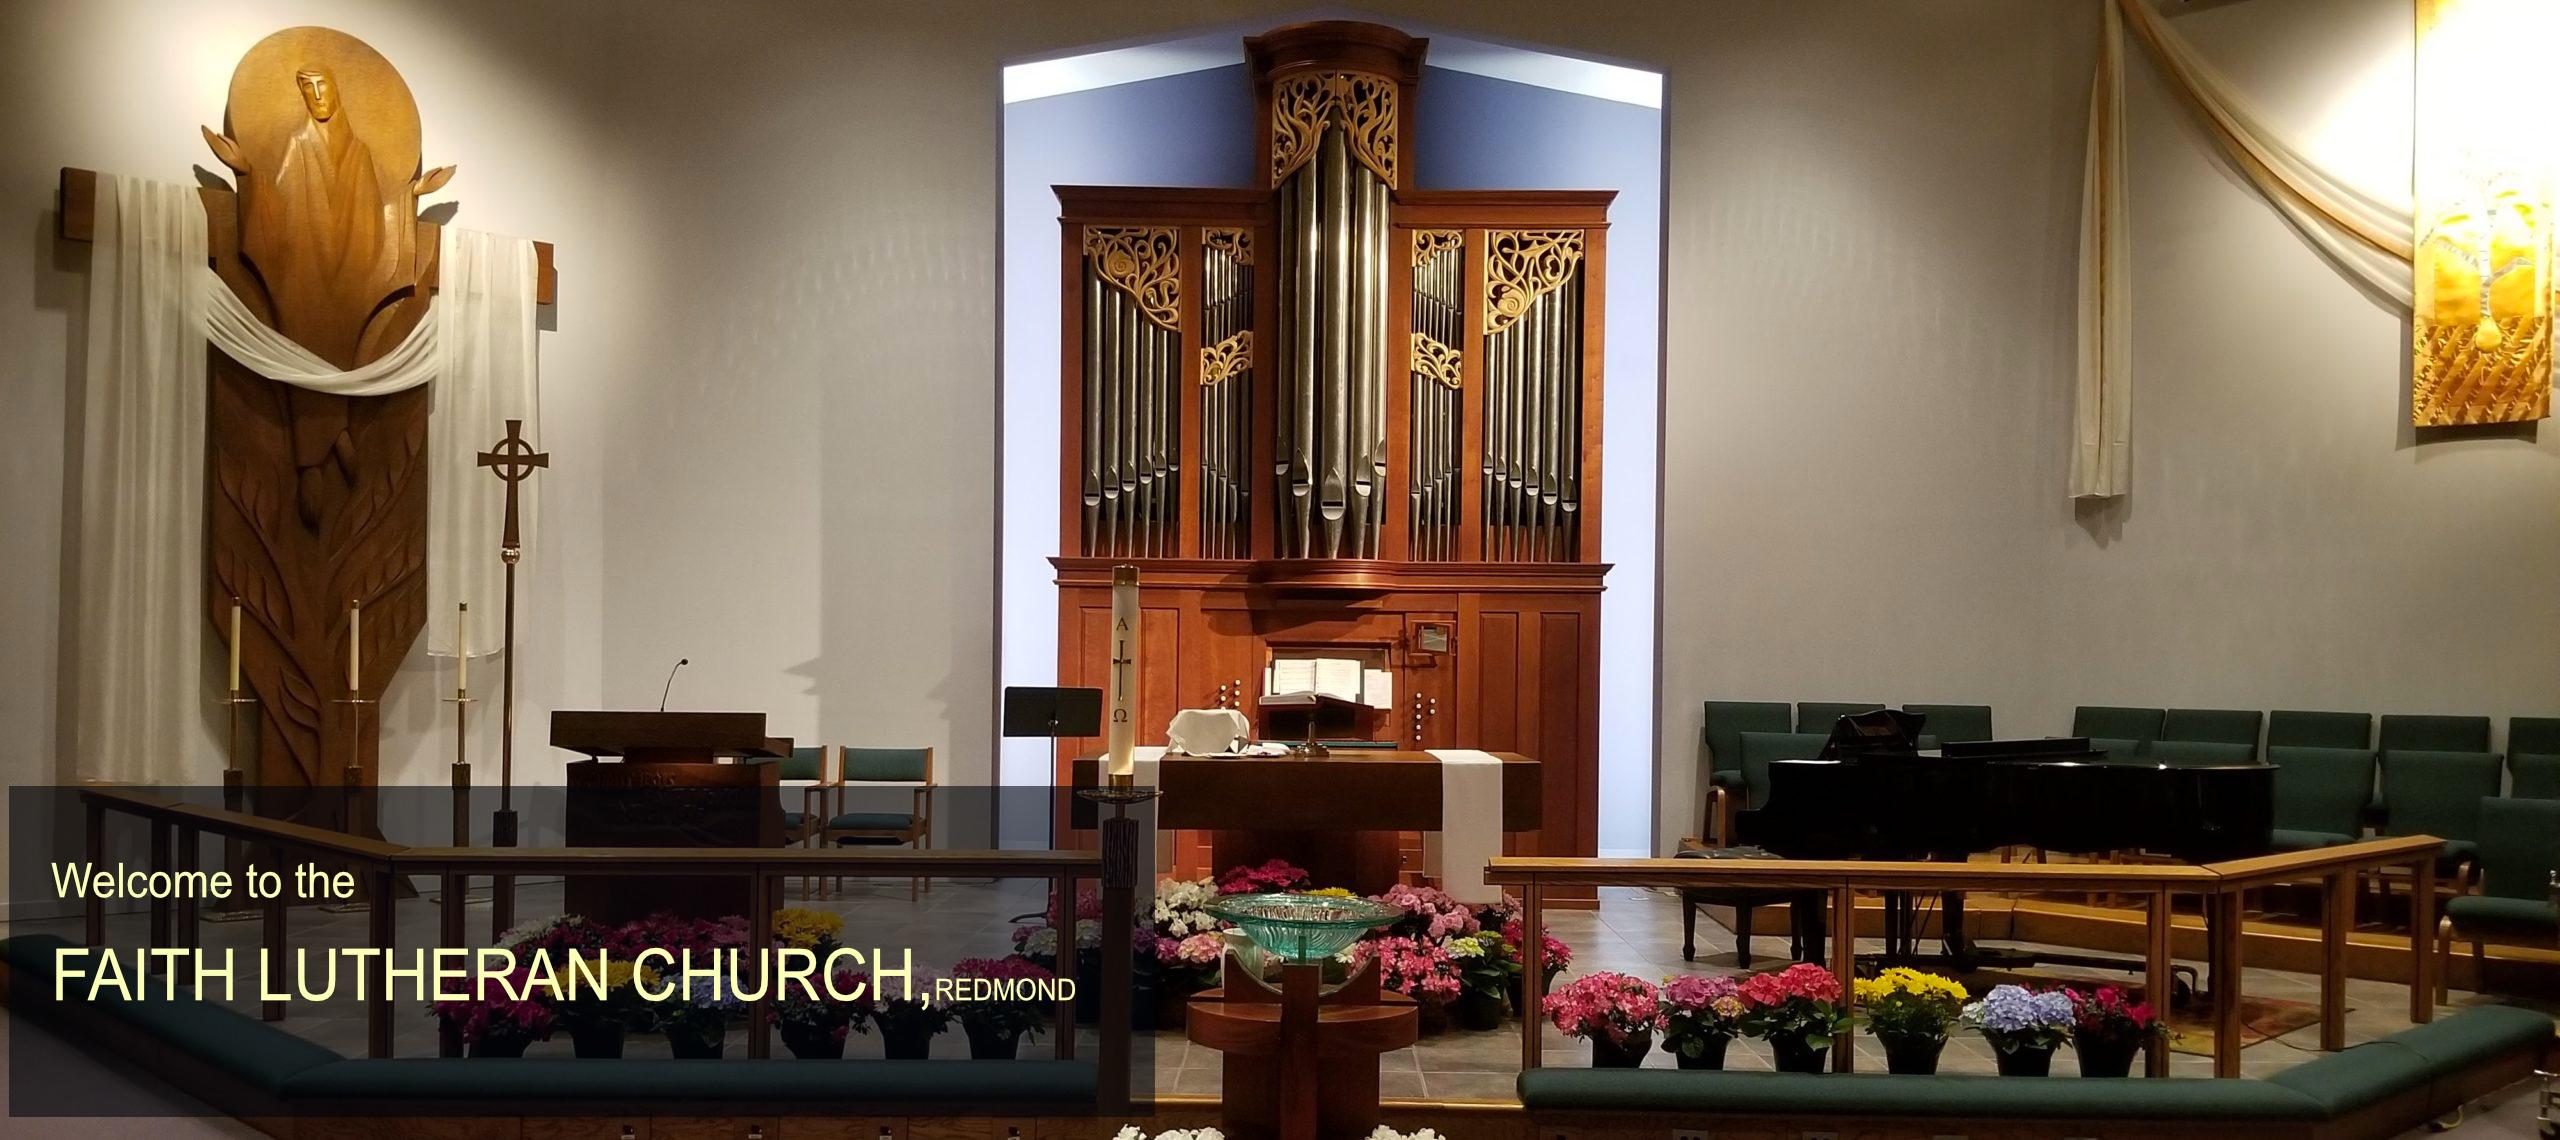 Welcome to the faith lutheran church redmond